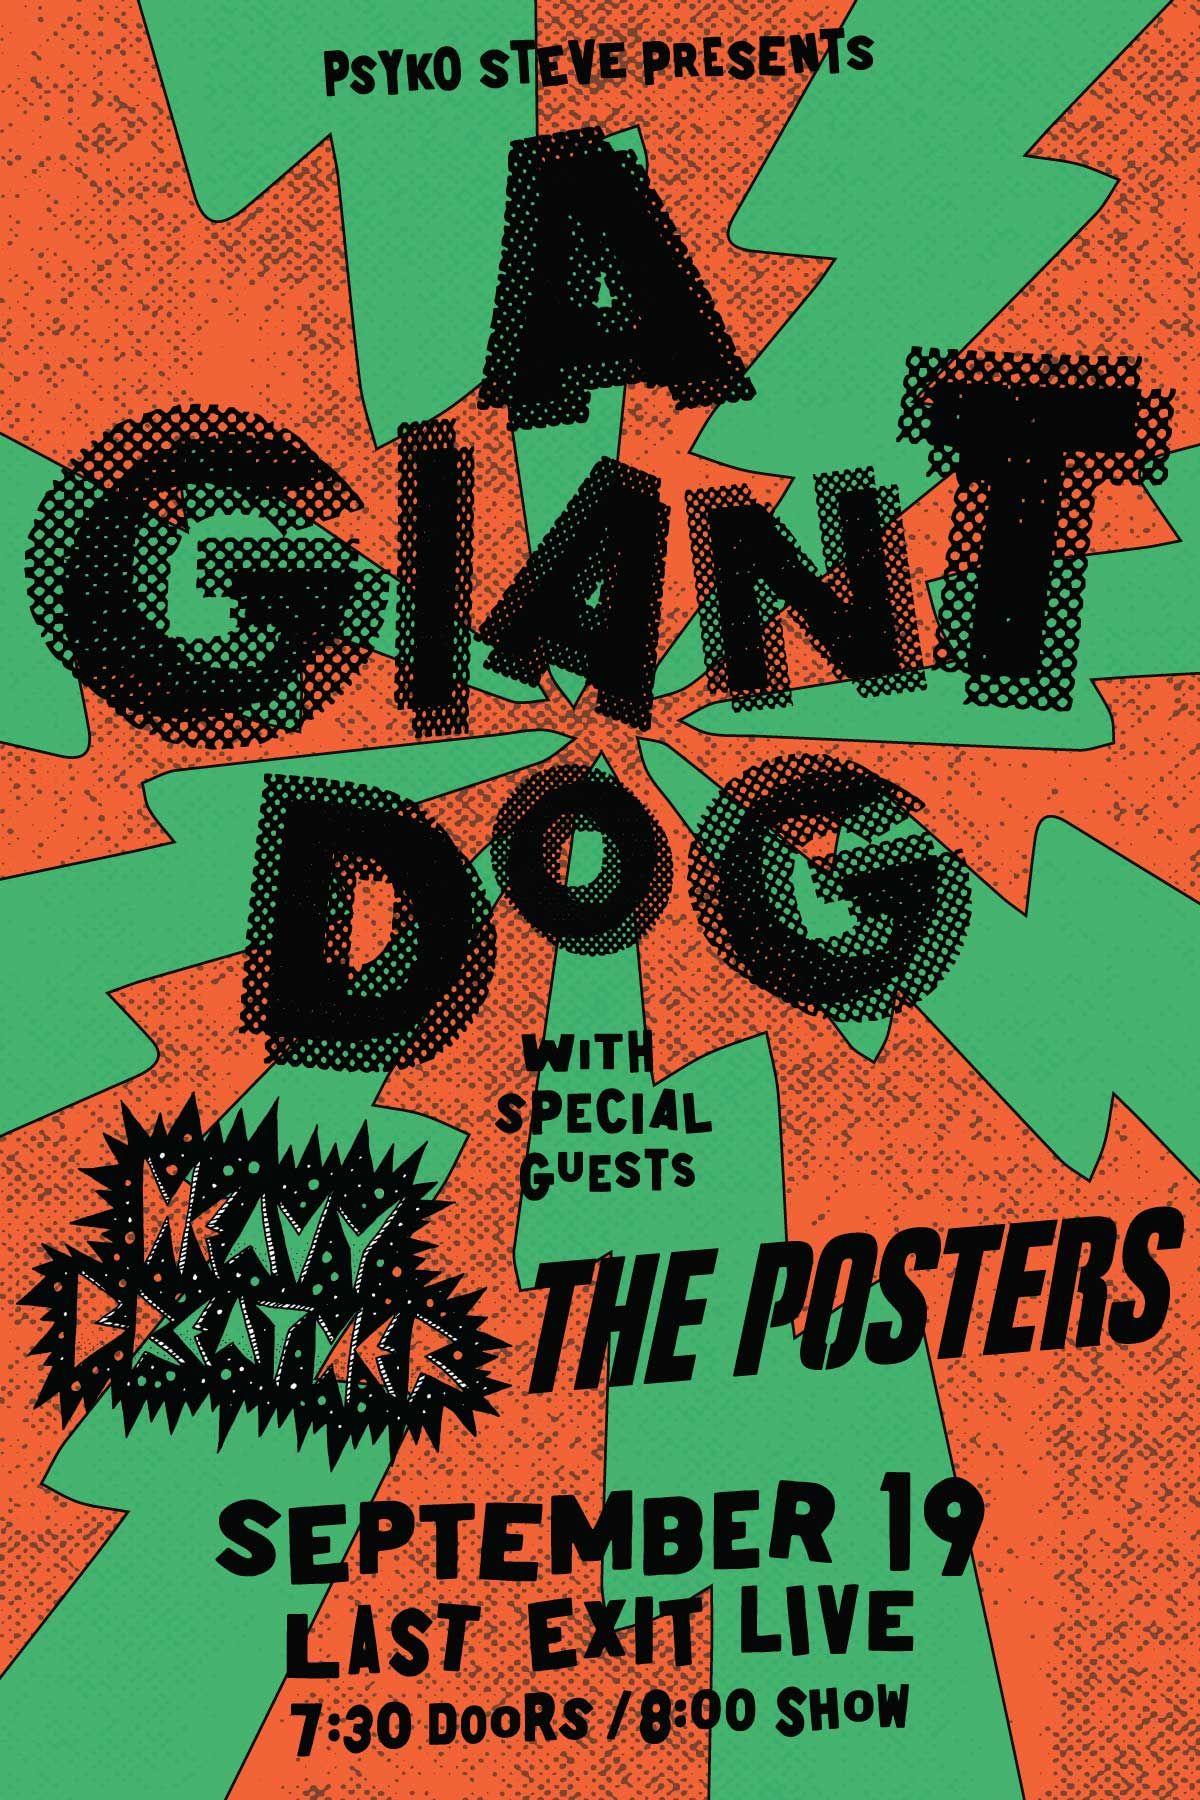 A GIANT DOG: